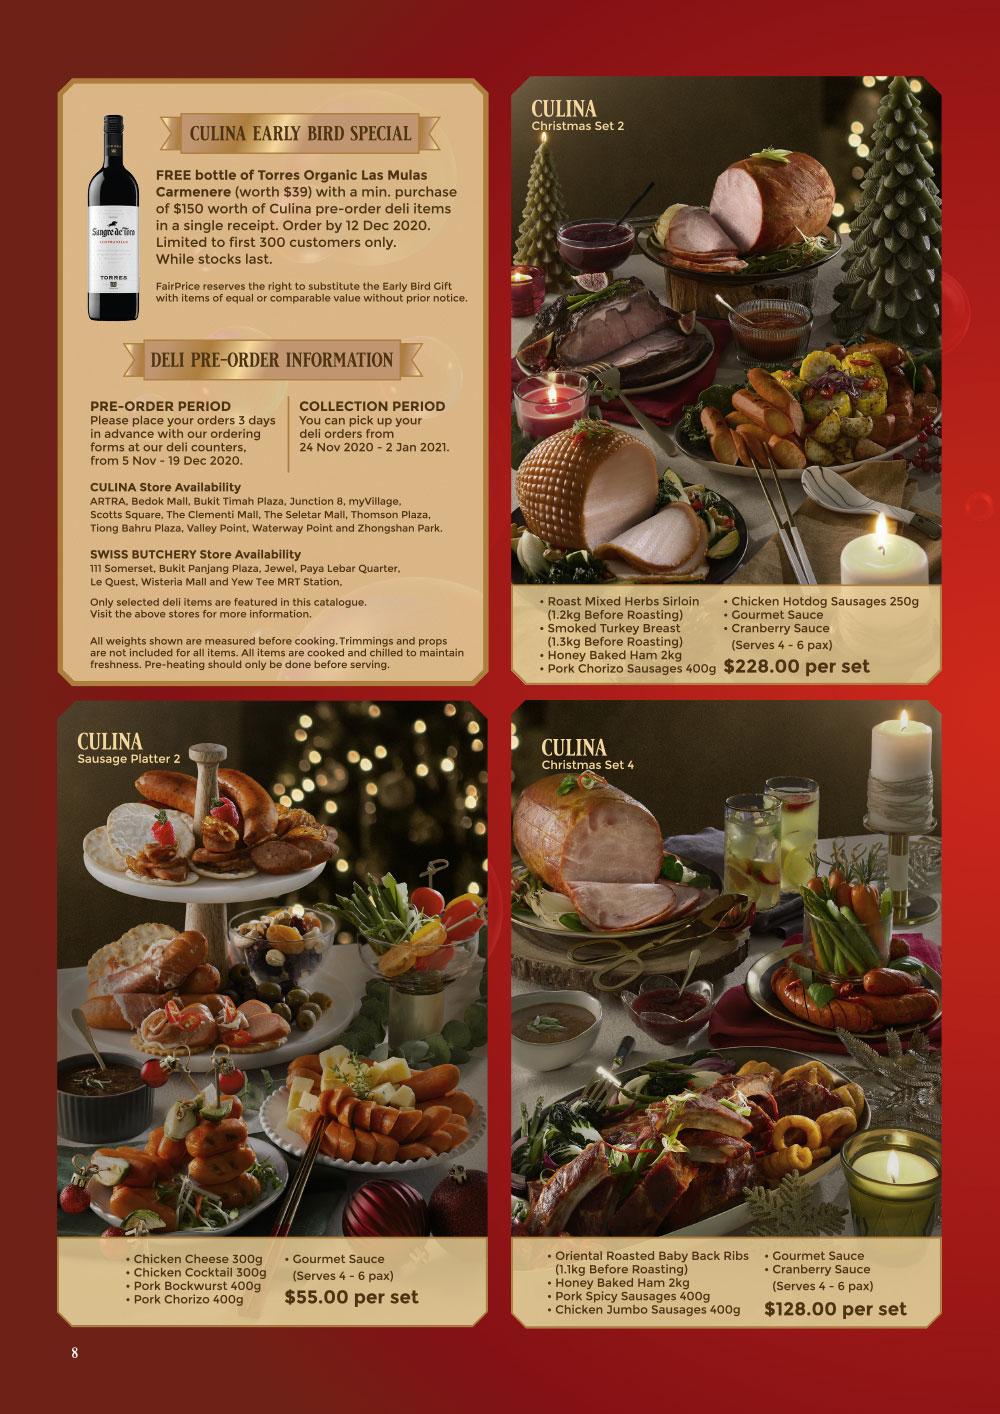 FairPrice Finest Christmas Catalogue 2020 - Recipes